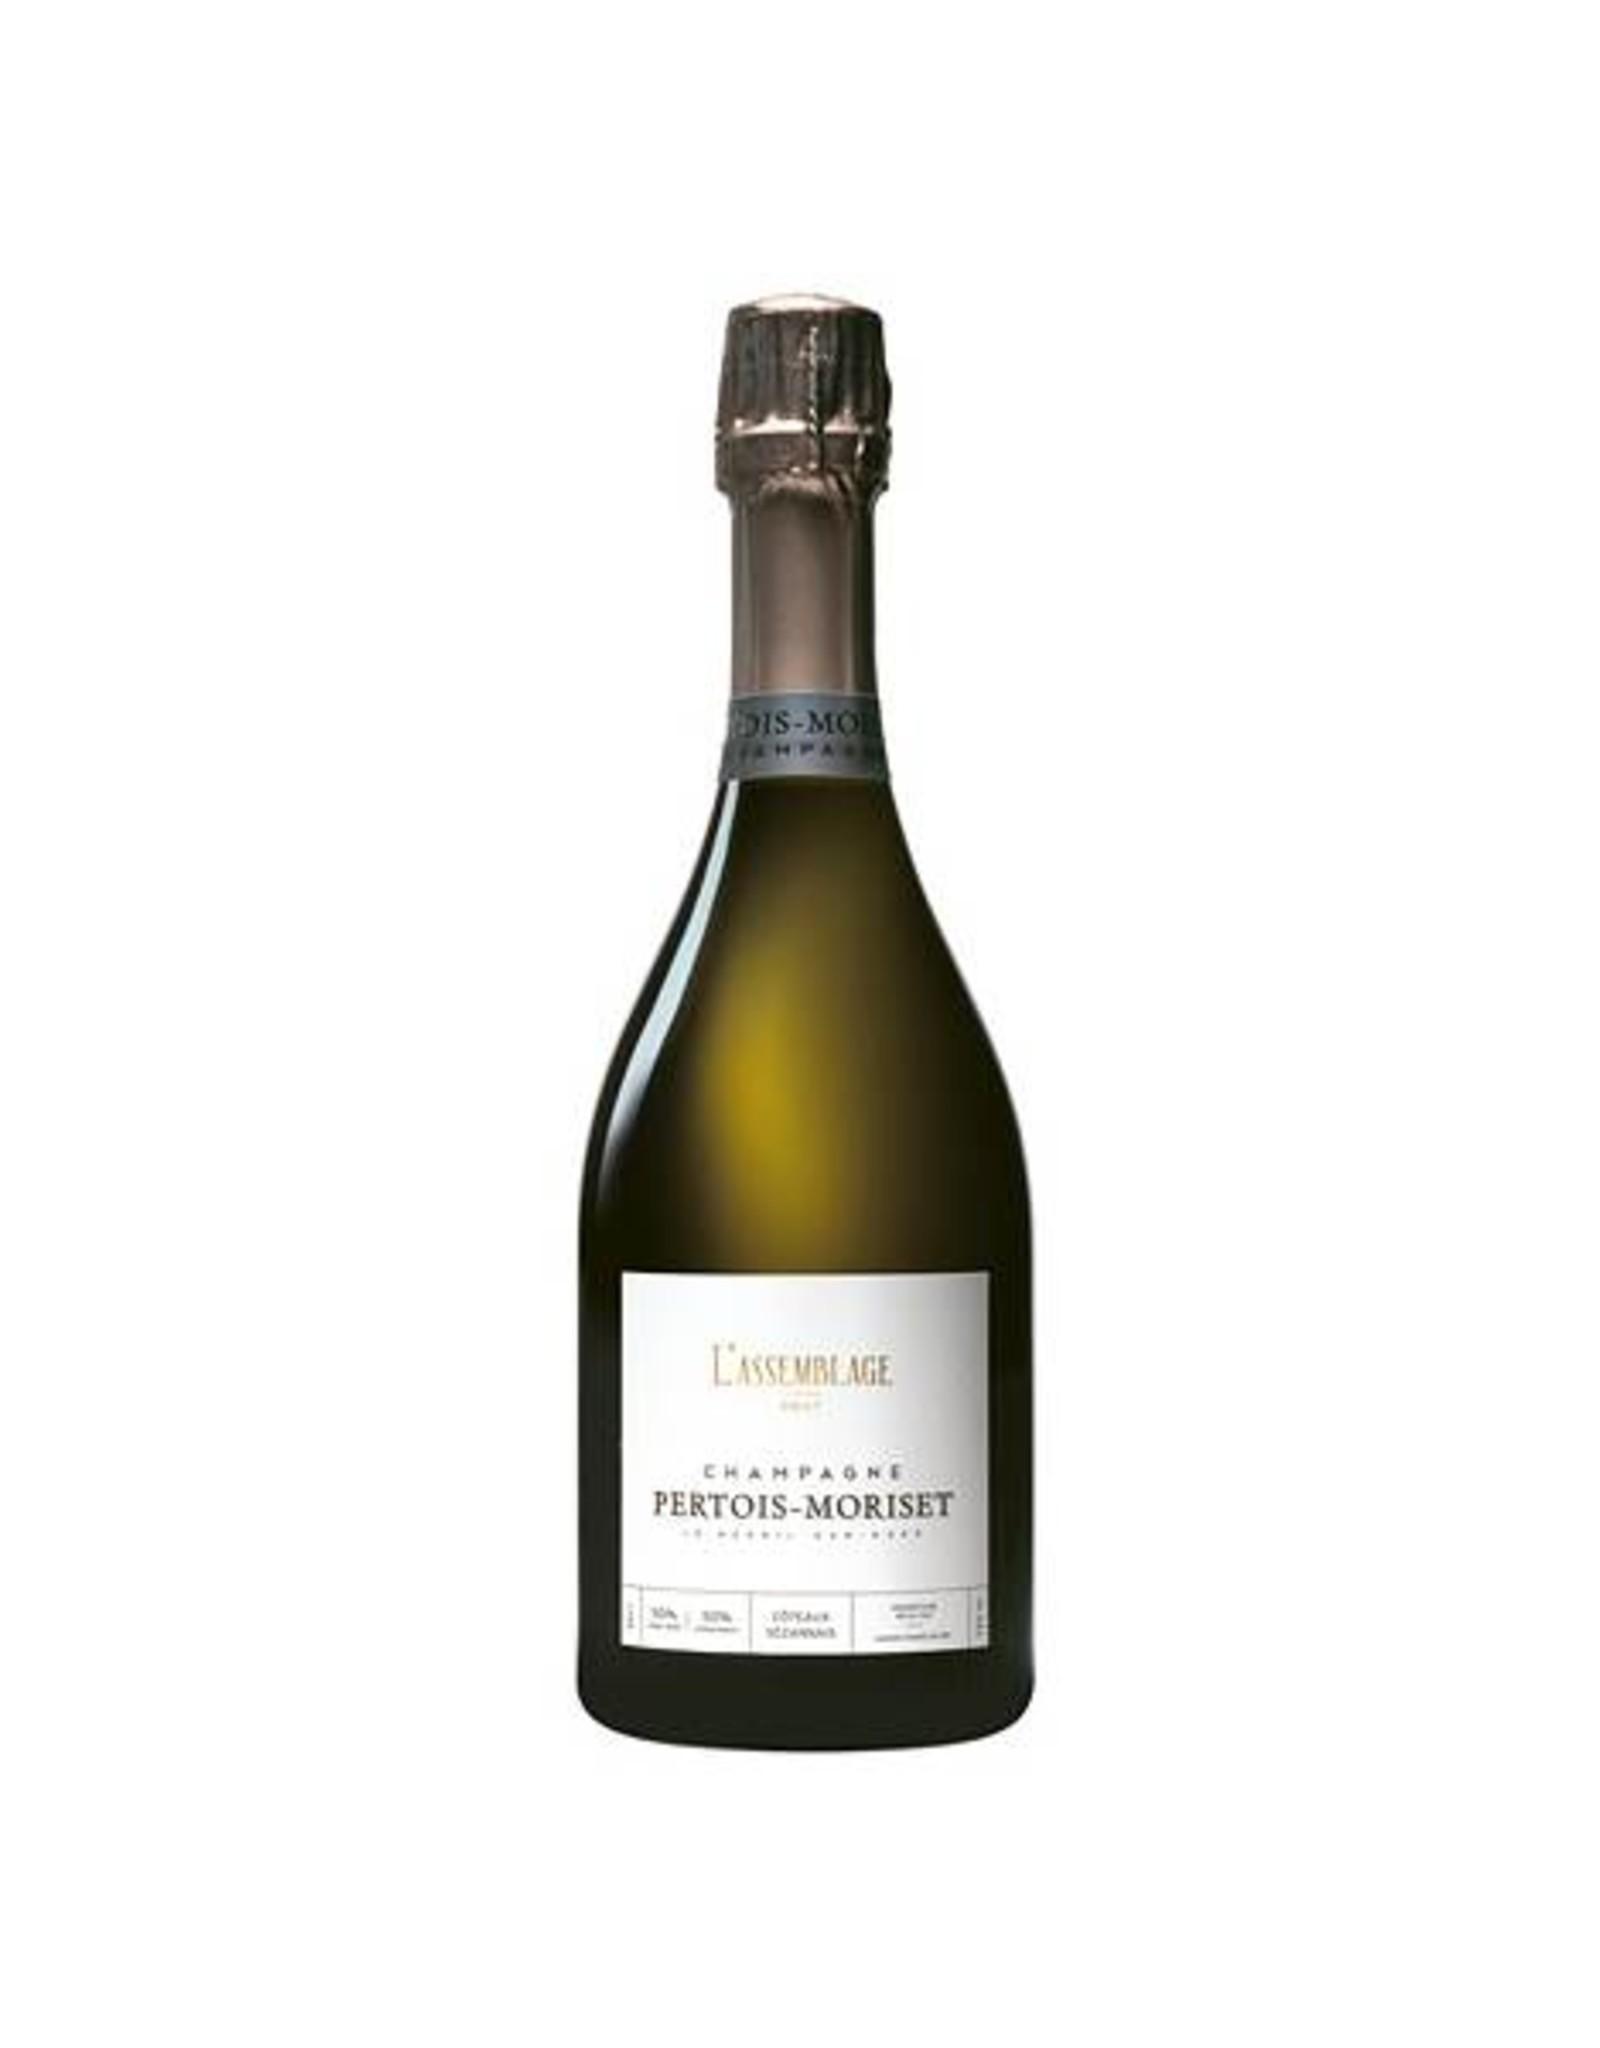 Pertois-Moriset, Champagne AOC, L'Assemblage - Extra Brut